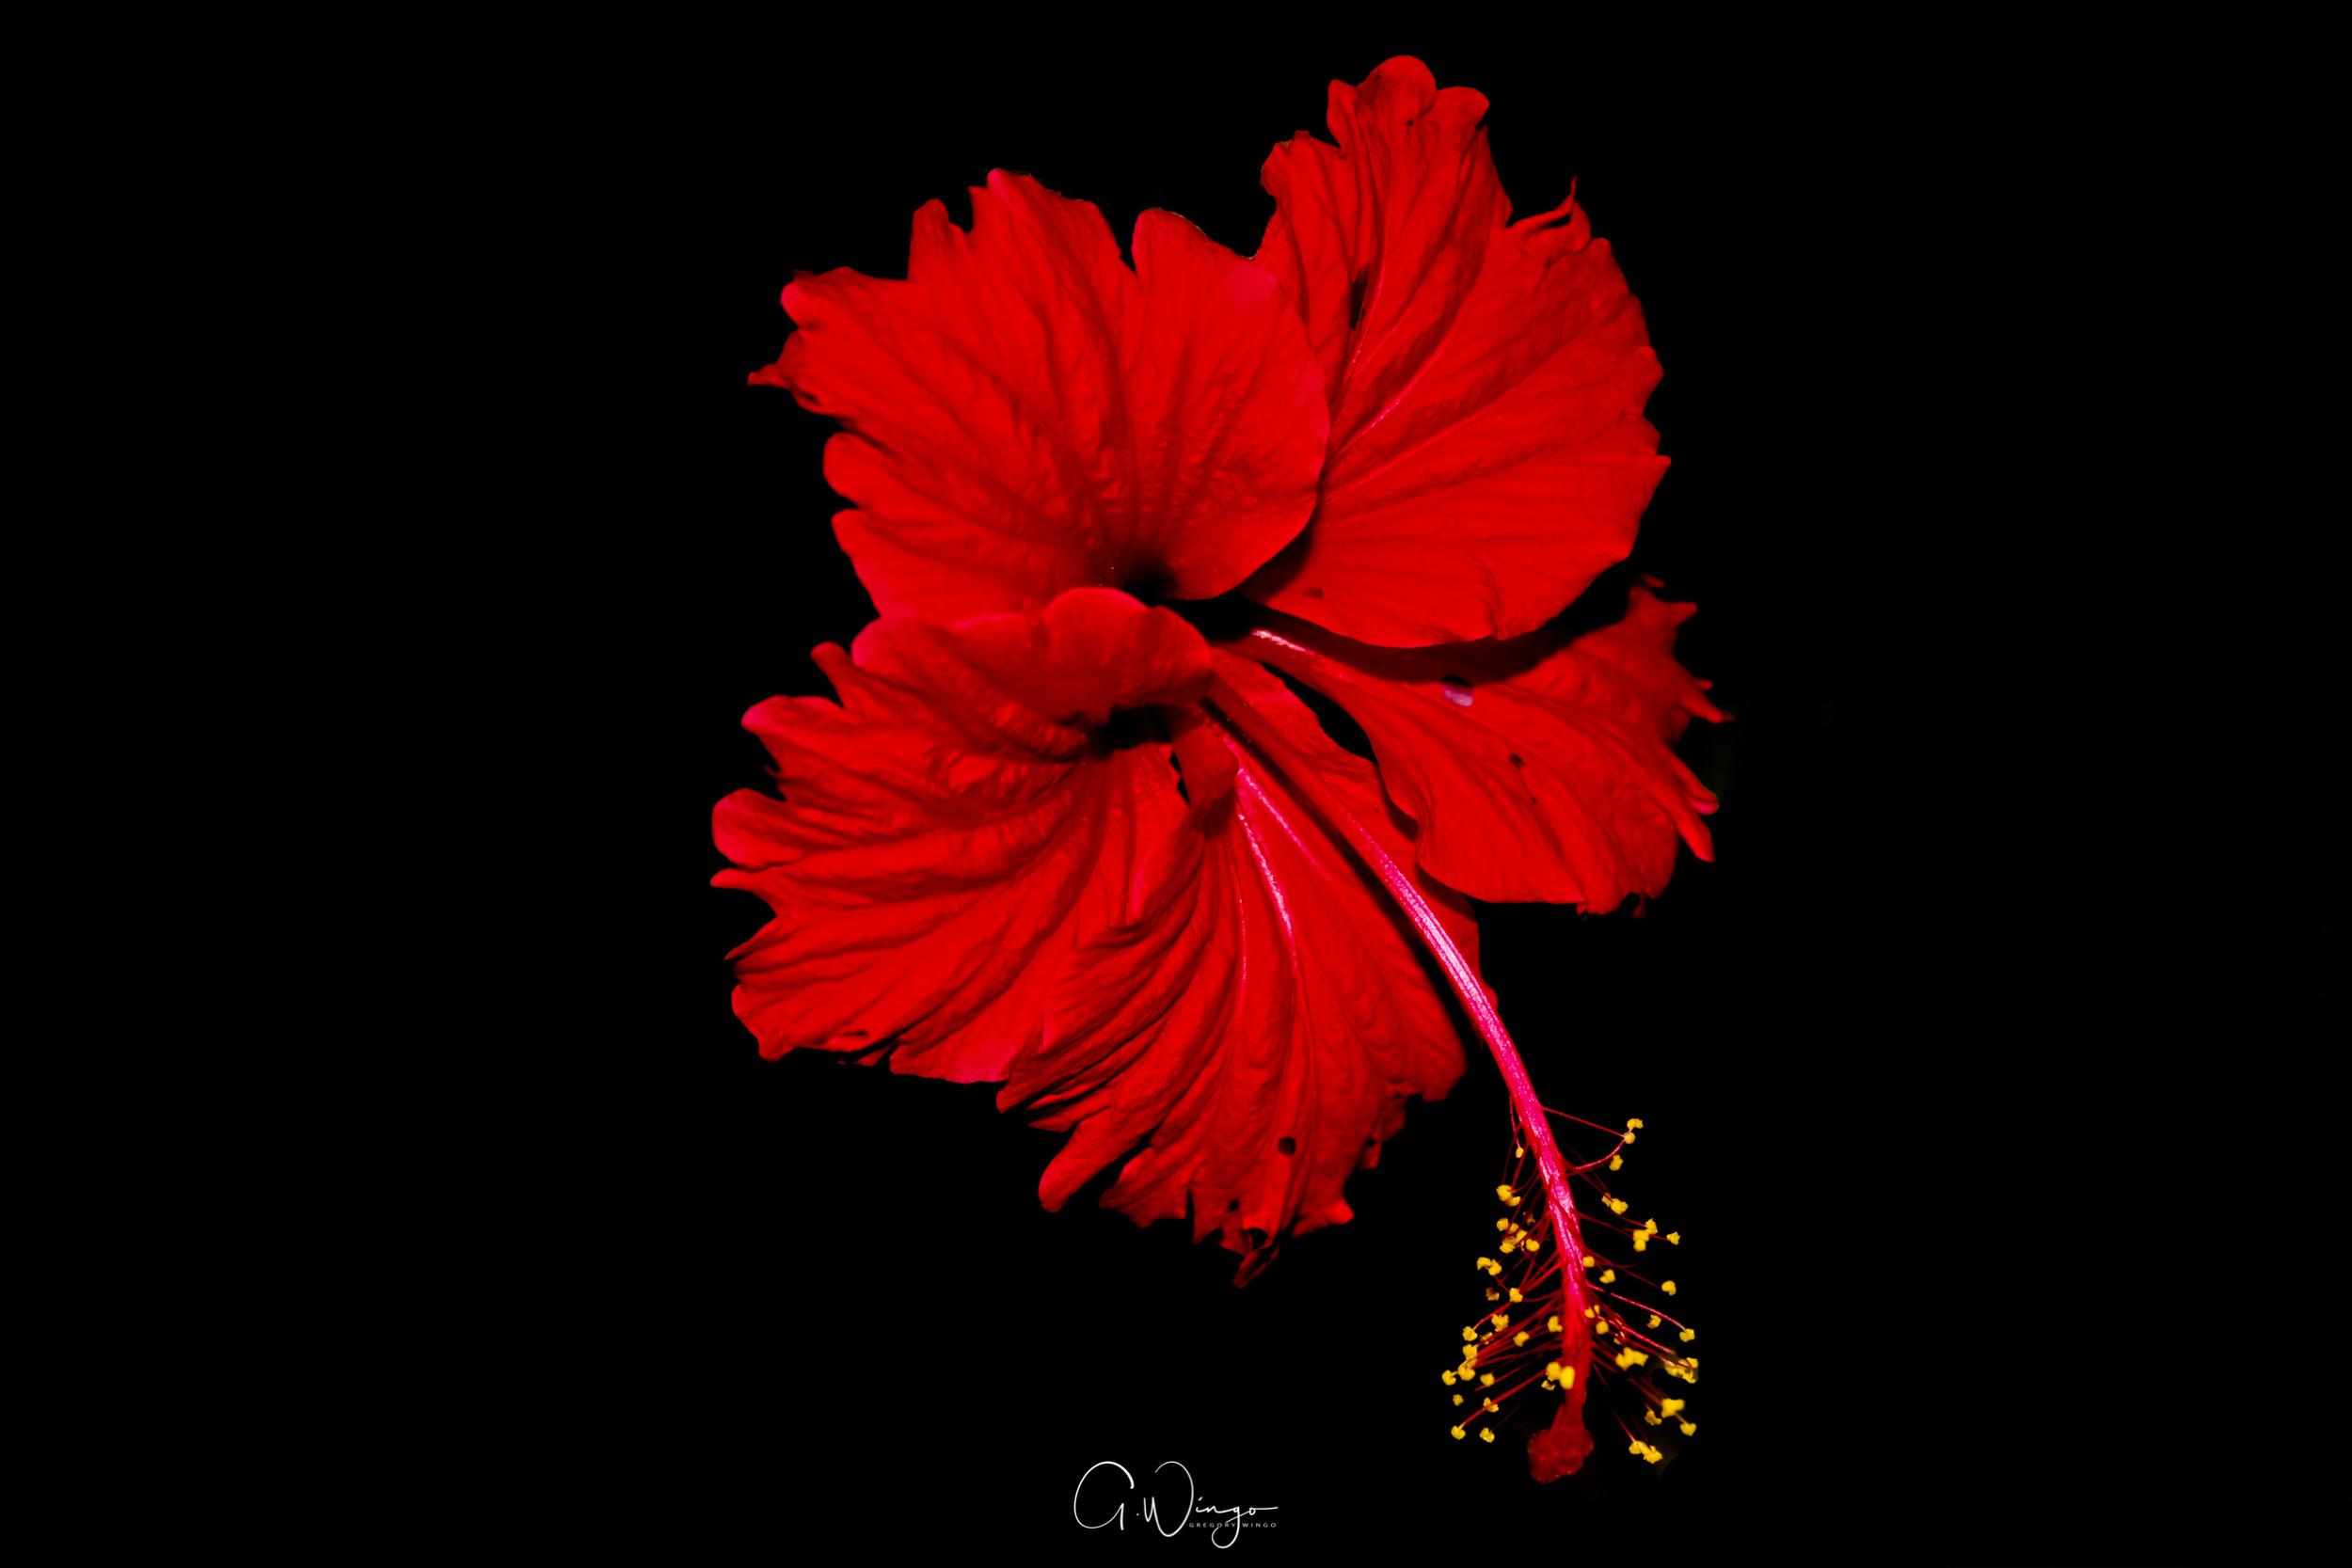 Fire Hibiscus